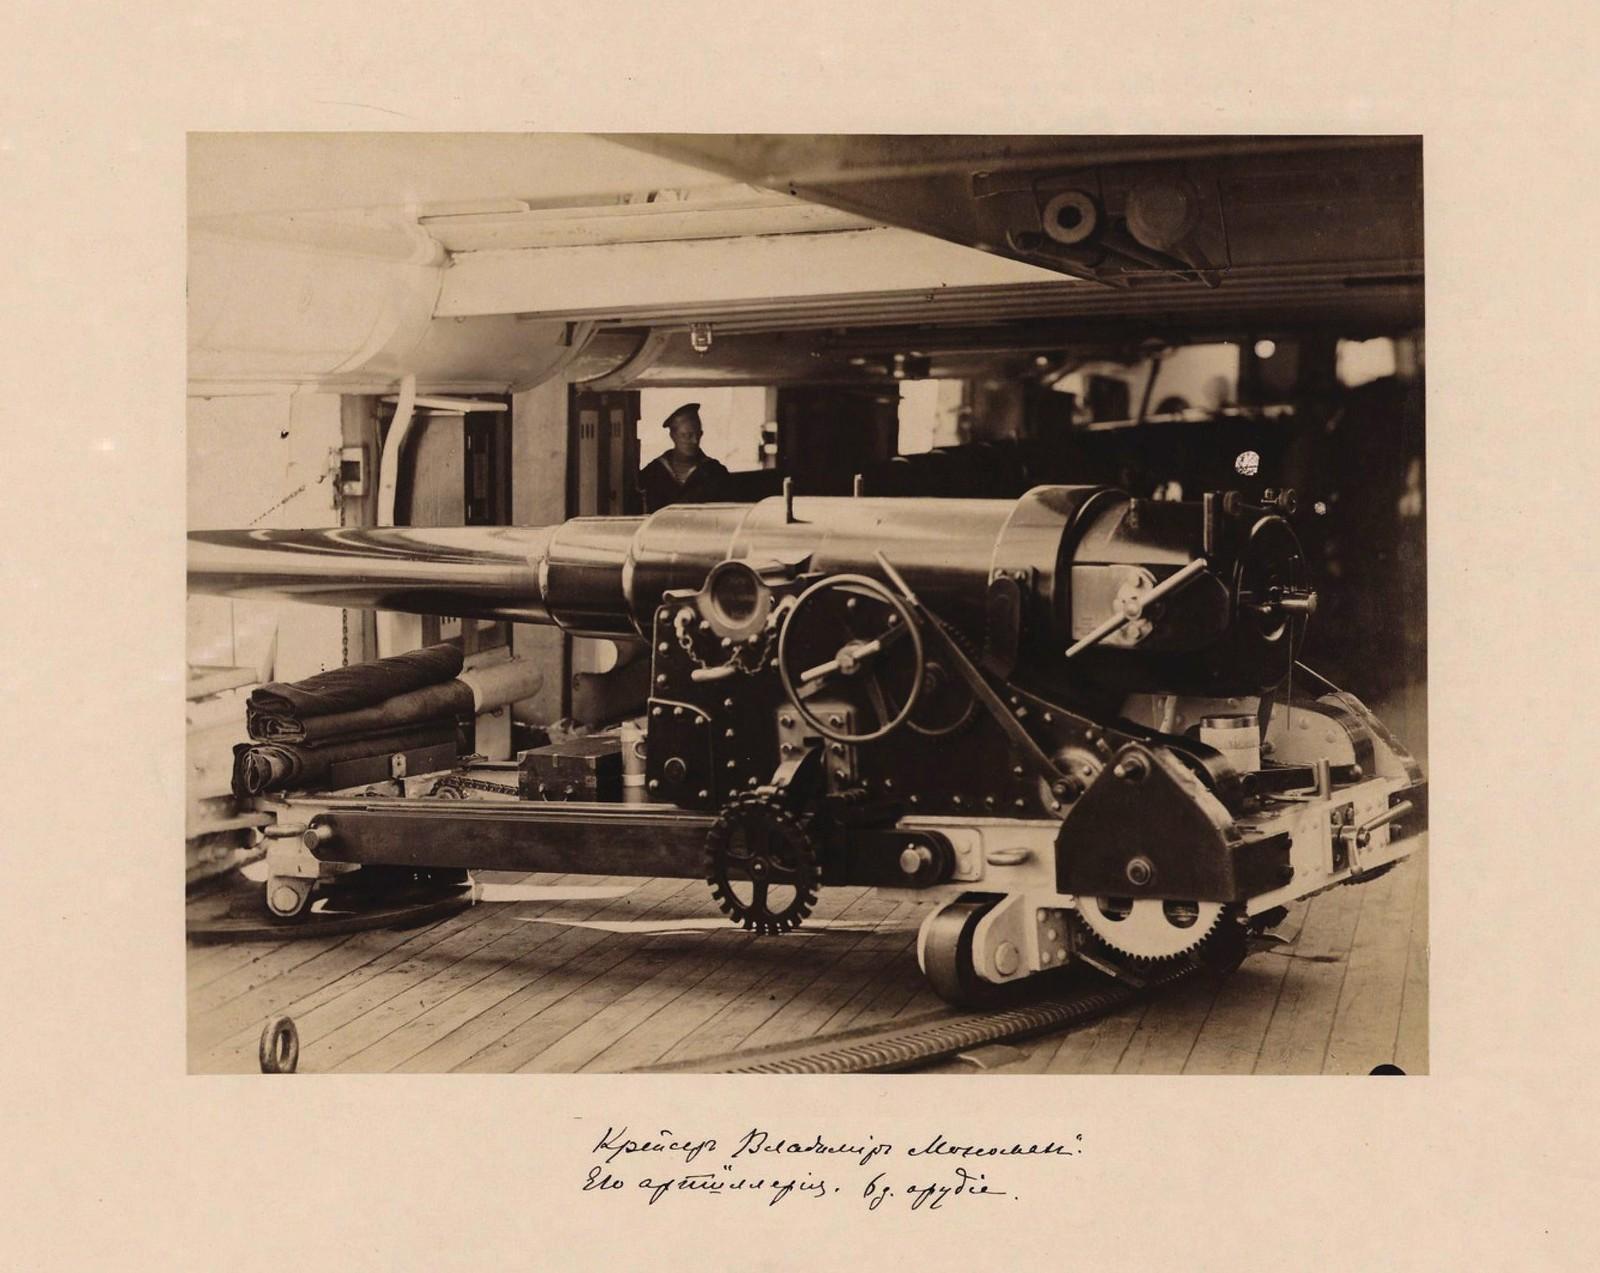 14. 1891. Цейлон. Крейсер «Владимир Мономах». Его артиллерия. 6-ти дюймовое орудие.